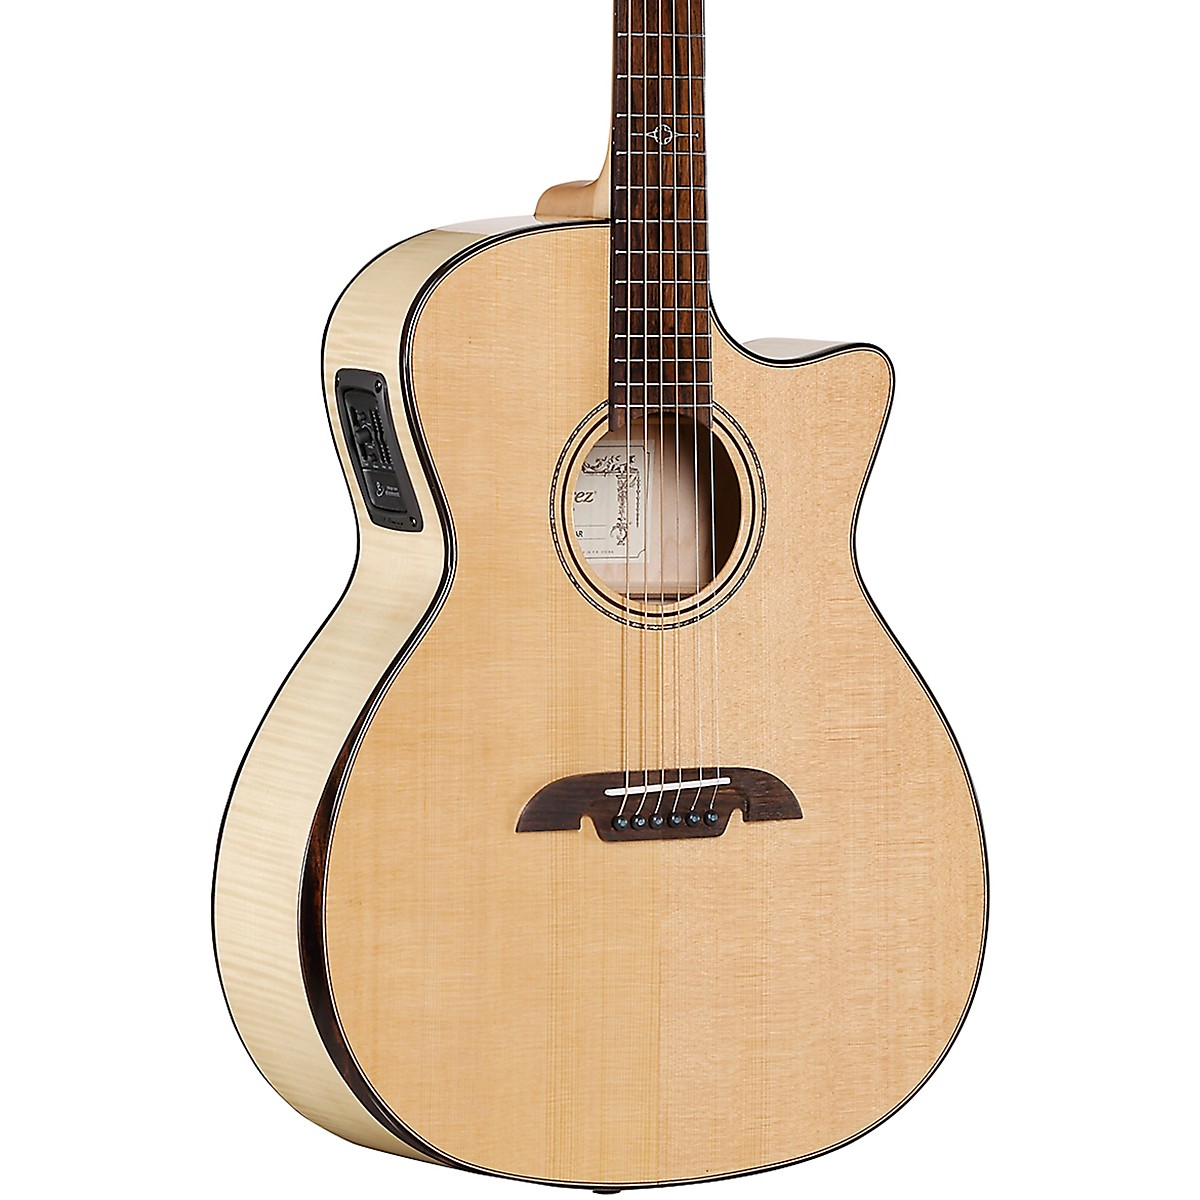 Alvarez AGFM80CEAR Artist Elite Grand Auditorium Acoustic-Electric Guitar